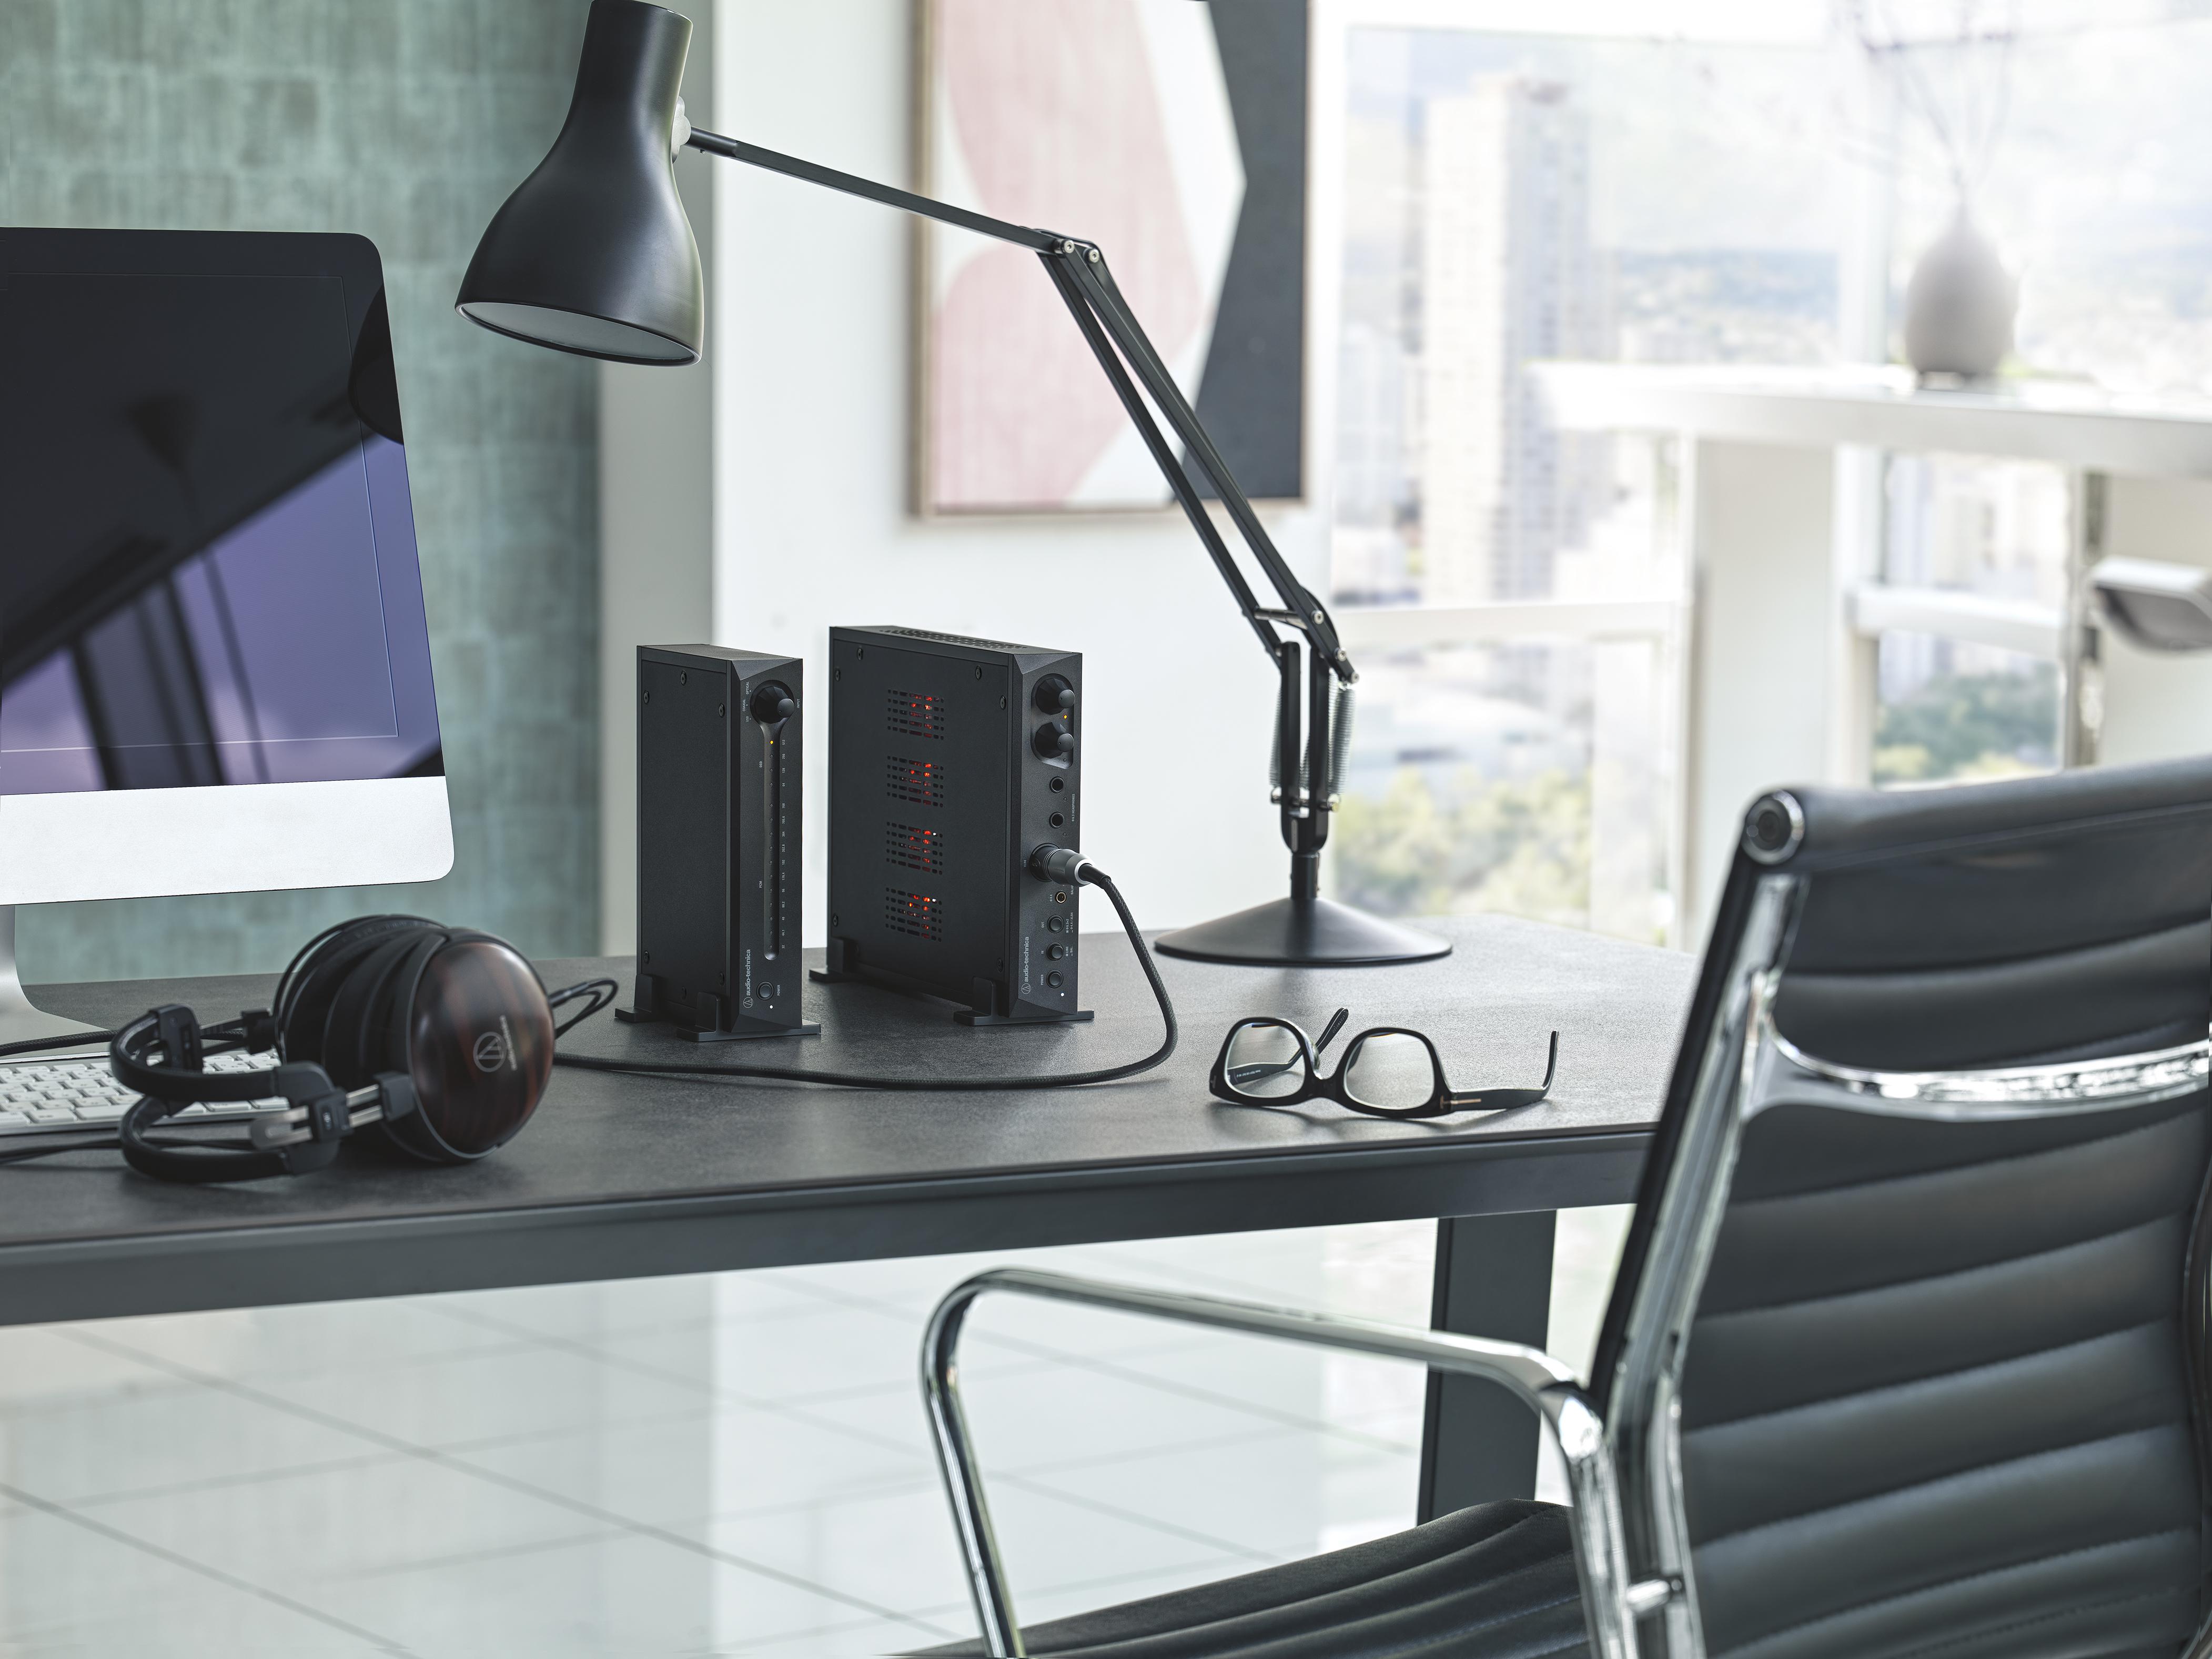 Audio-Technica's Releases New Balanced Headphone Amplifier, AT-BHA100